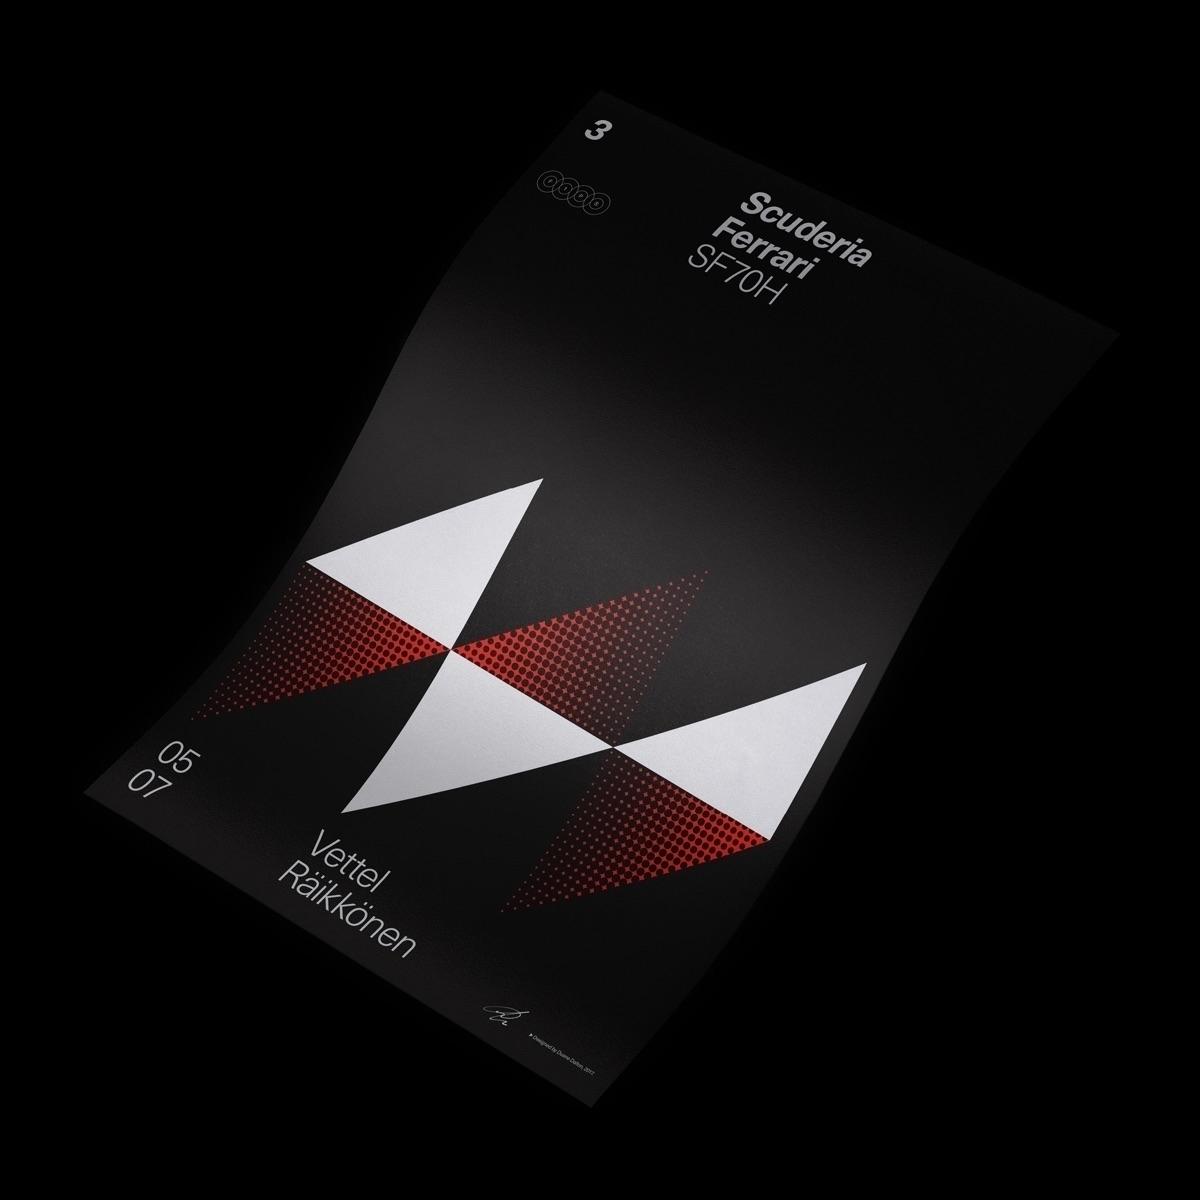 Formula Poster Series 2017 — 3 - duanedalton | ello